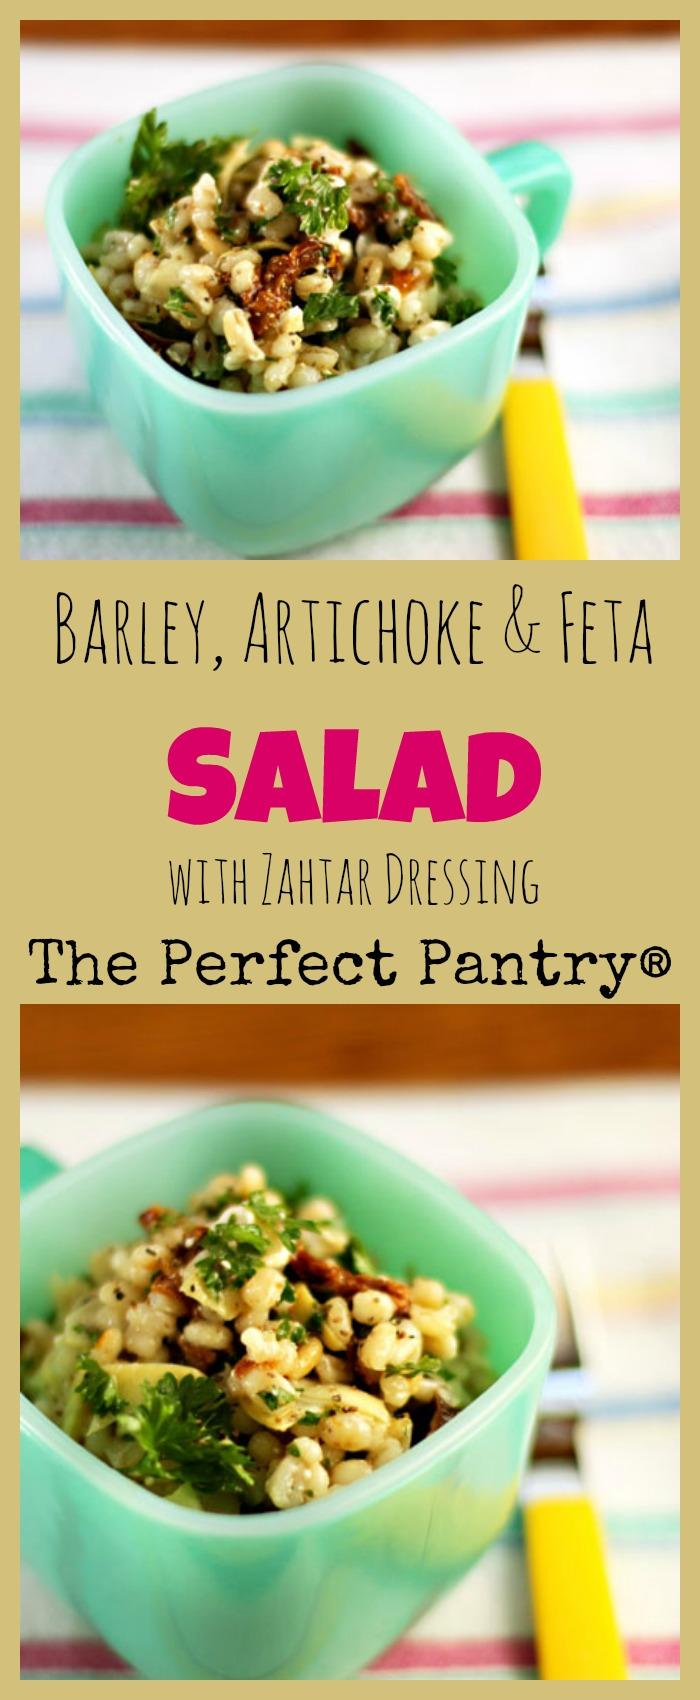 Barley salad with artichokes, sun-dried tomatoes and feta, and a lemony zahtar dressing. #vegetarian